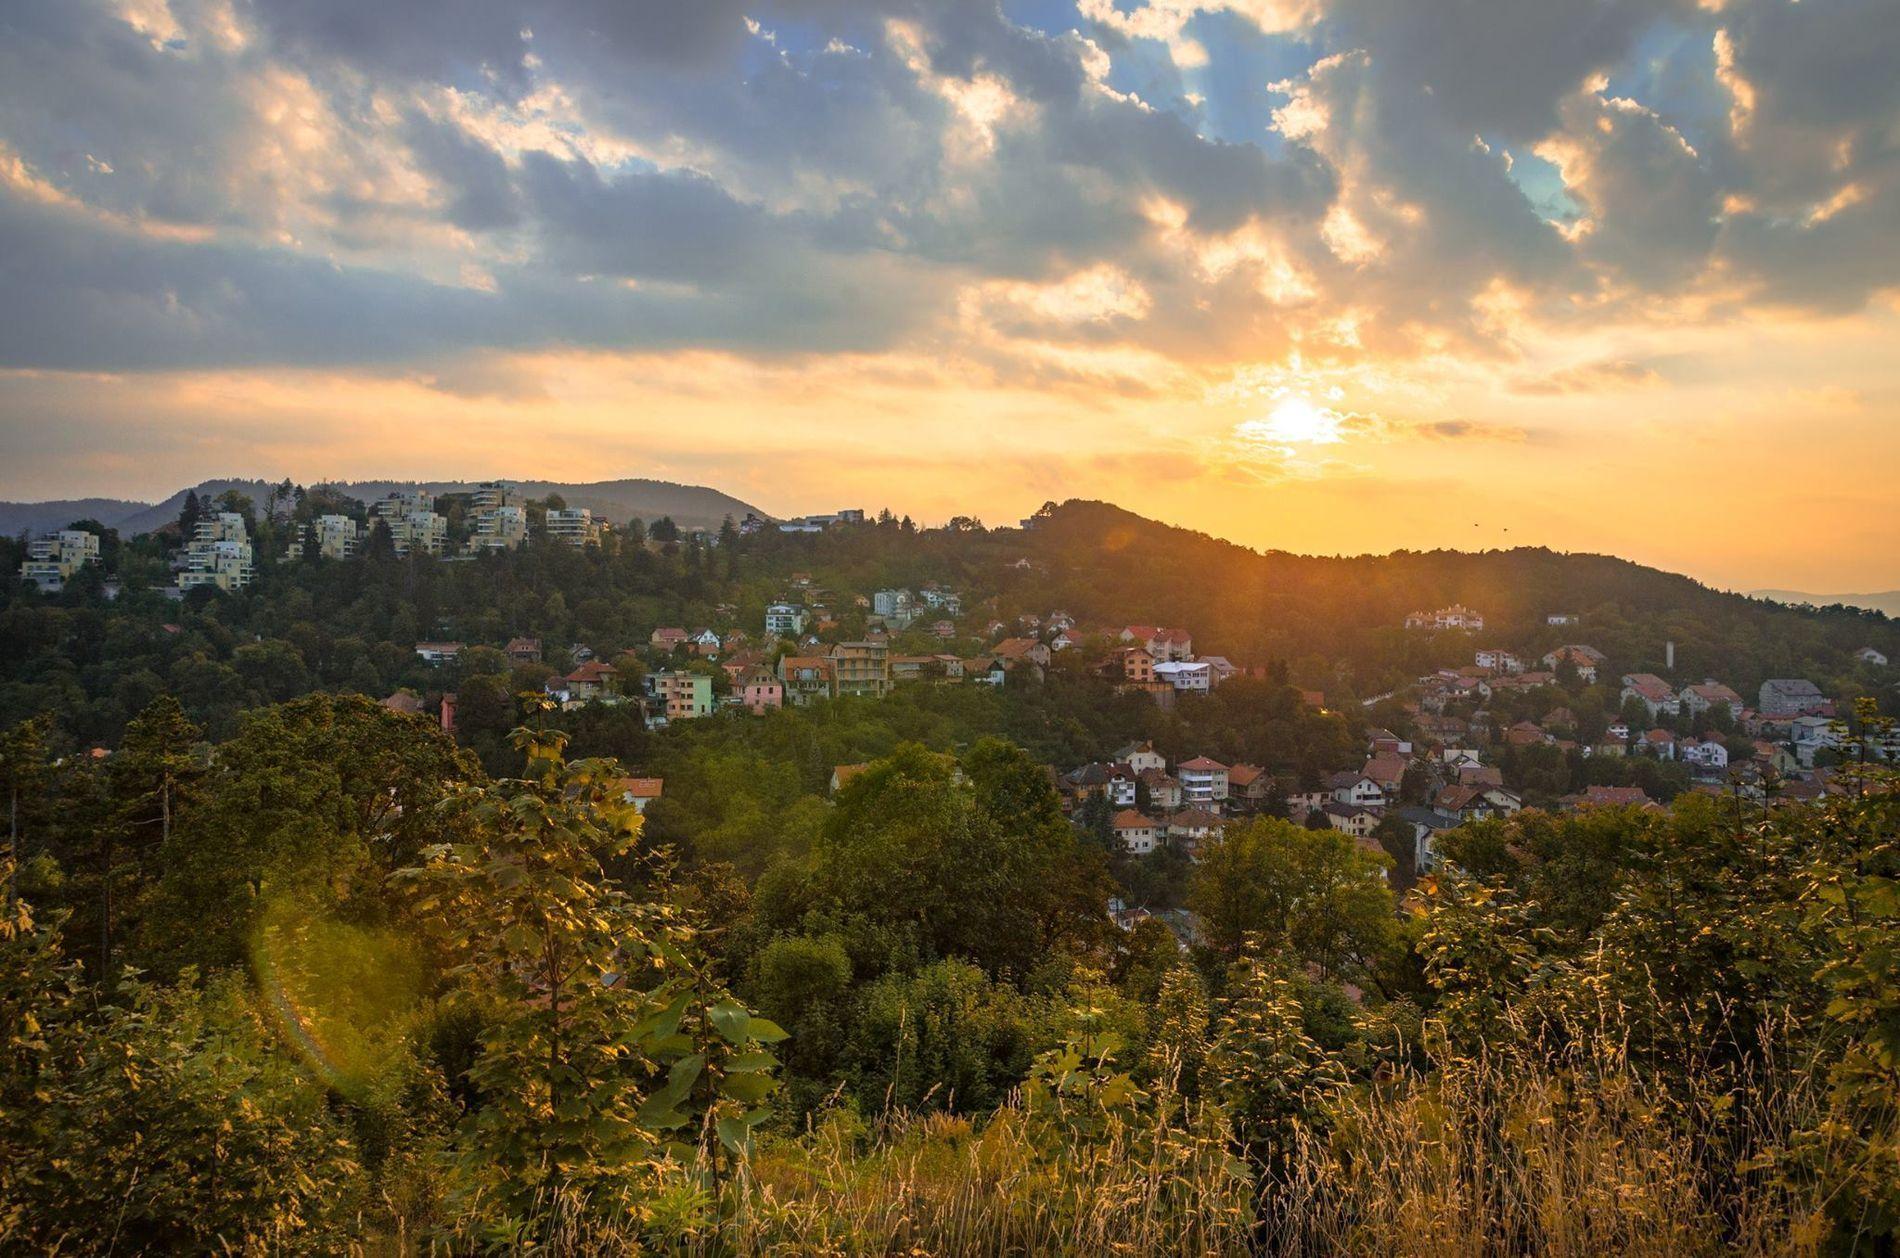 Sunset near Brasov's Fortification, Romania